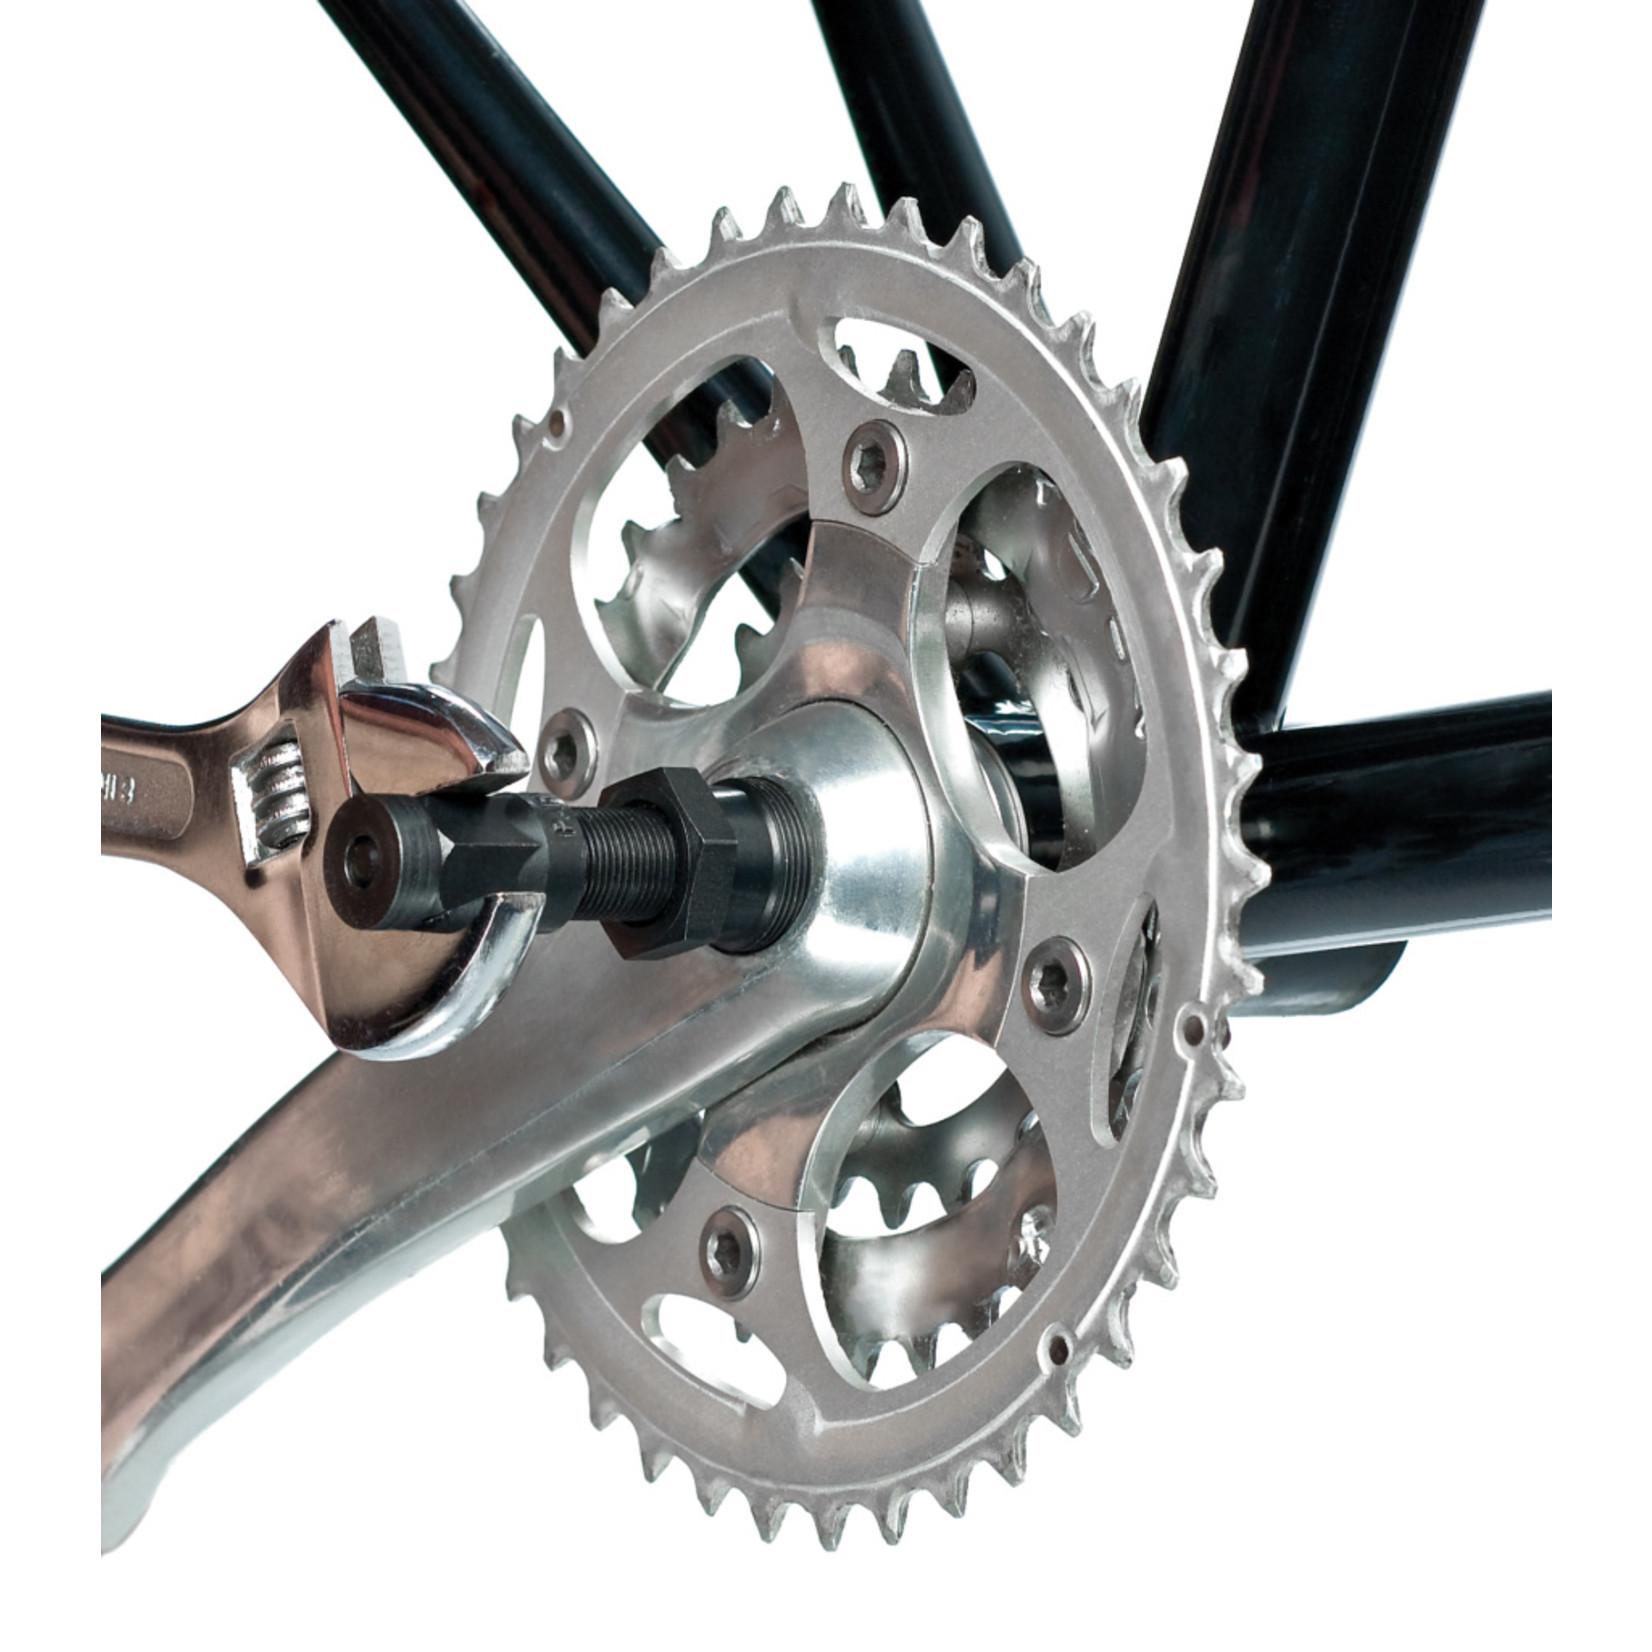 Park Tool Park Tool CWP-7 Compact crank puller